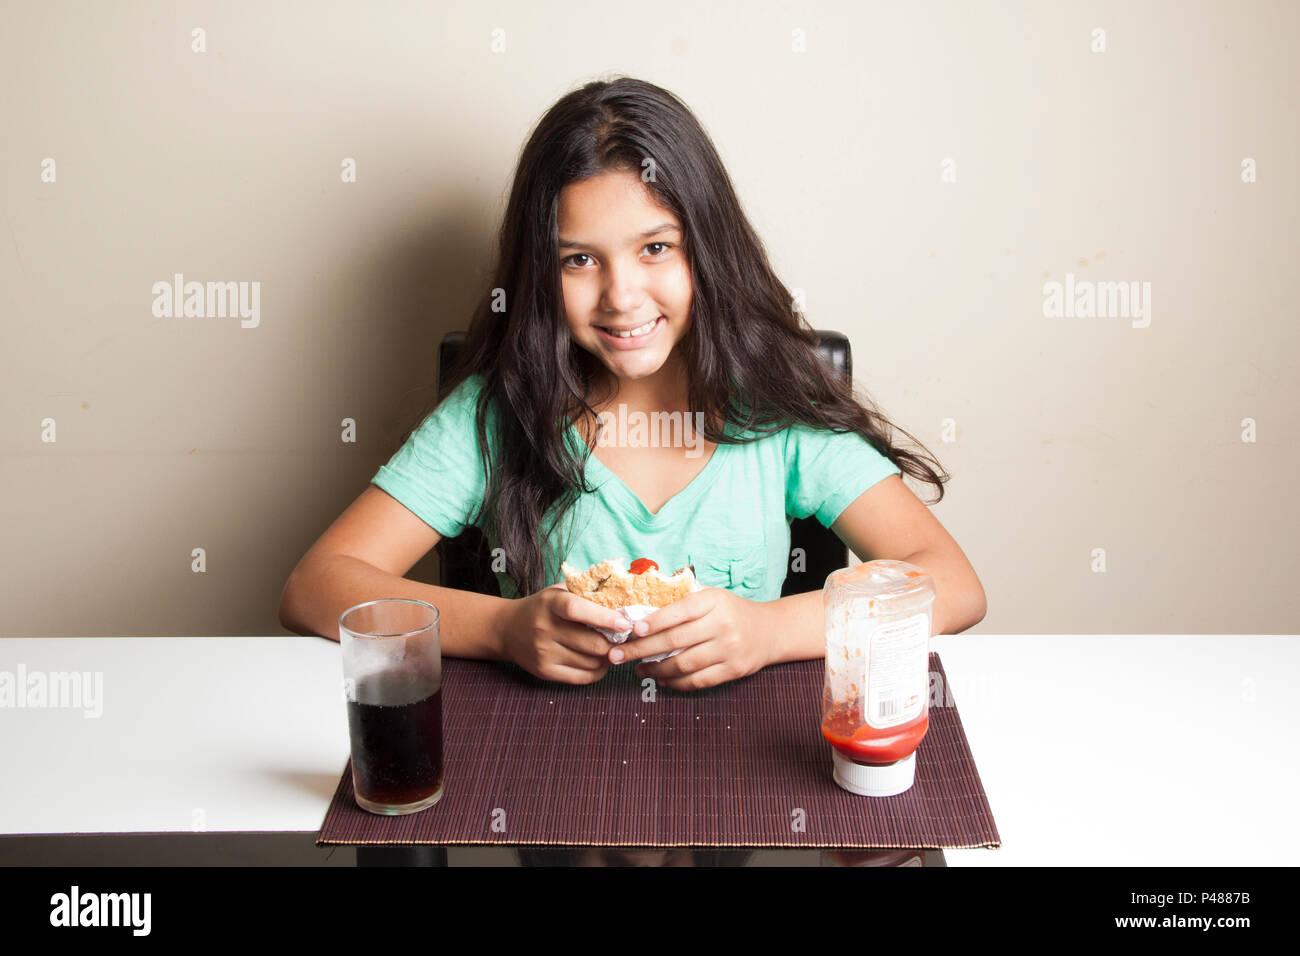 Adolescente comendo hamburguer. São Paulo/SP, BRÉSIL. 030/03/2015. Foto: Irene Araujo / Fotoarena. Photo Stock